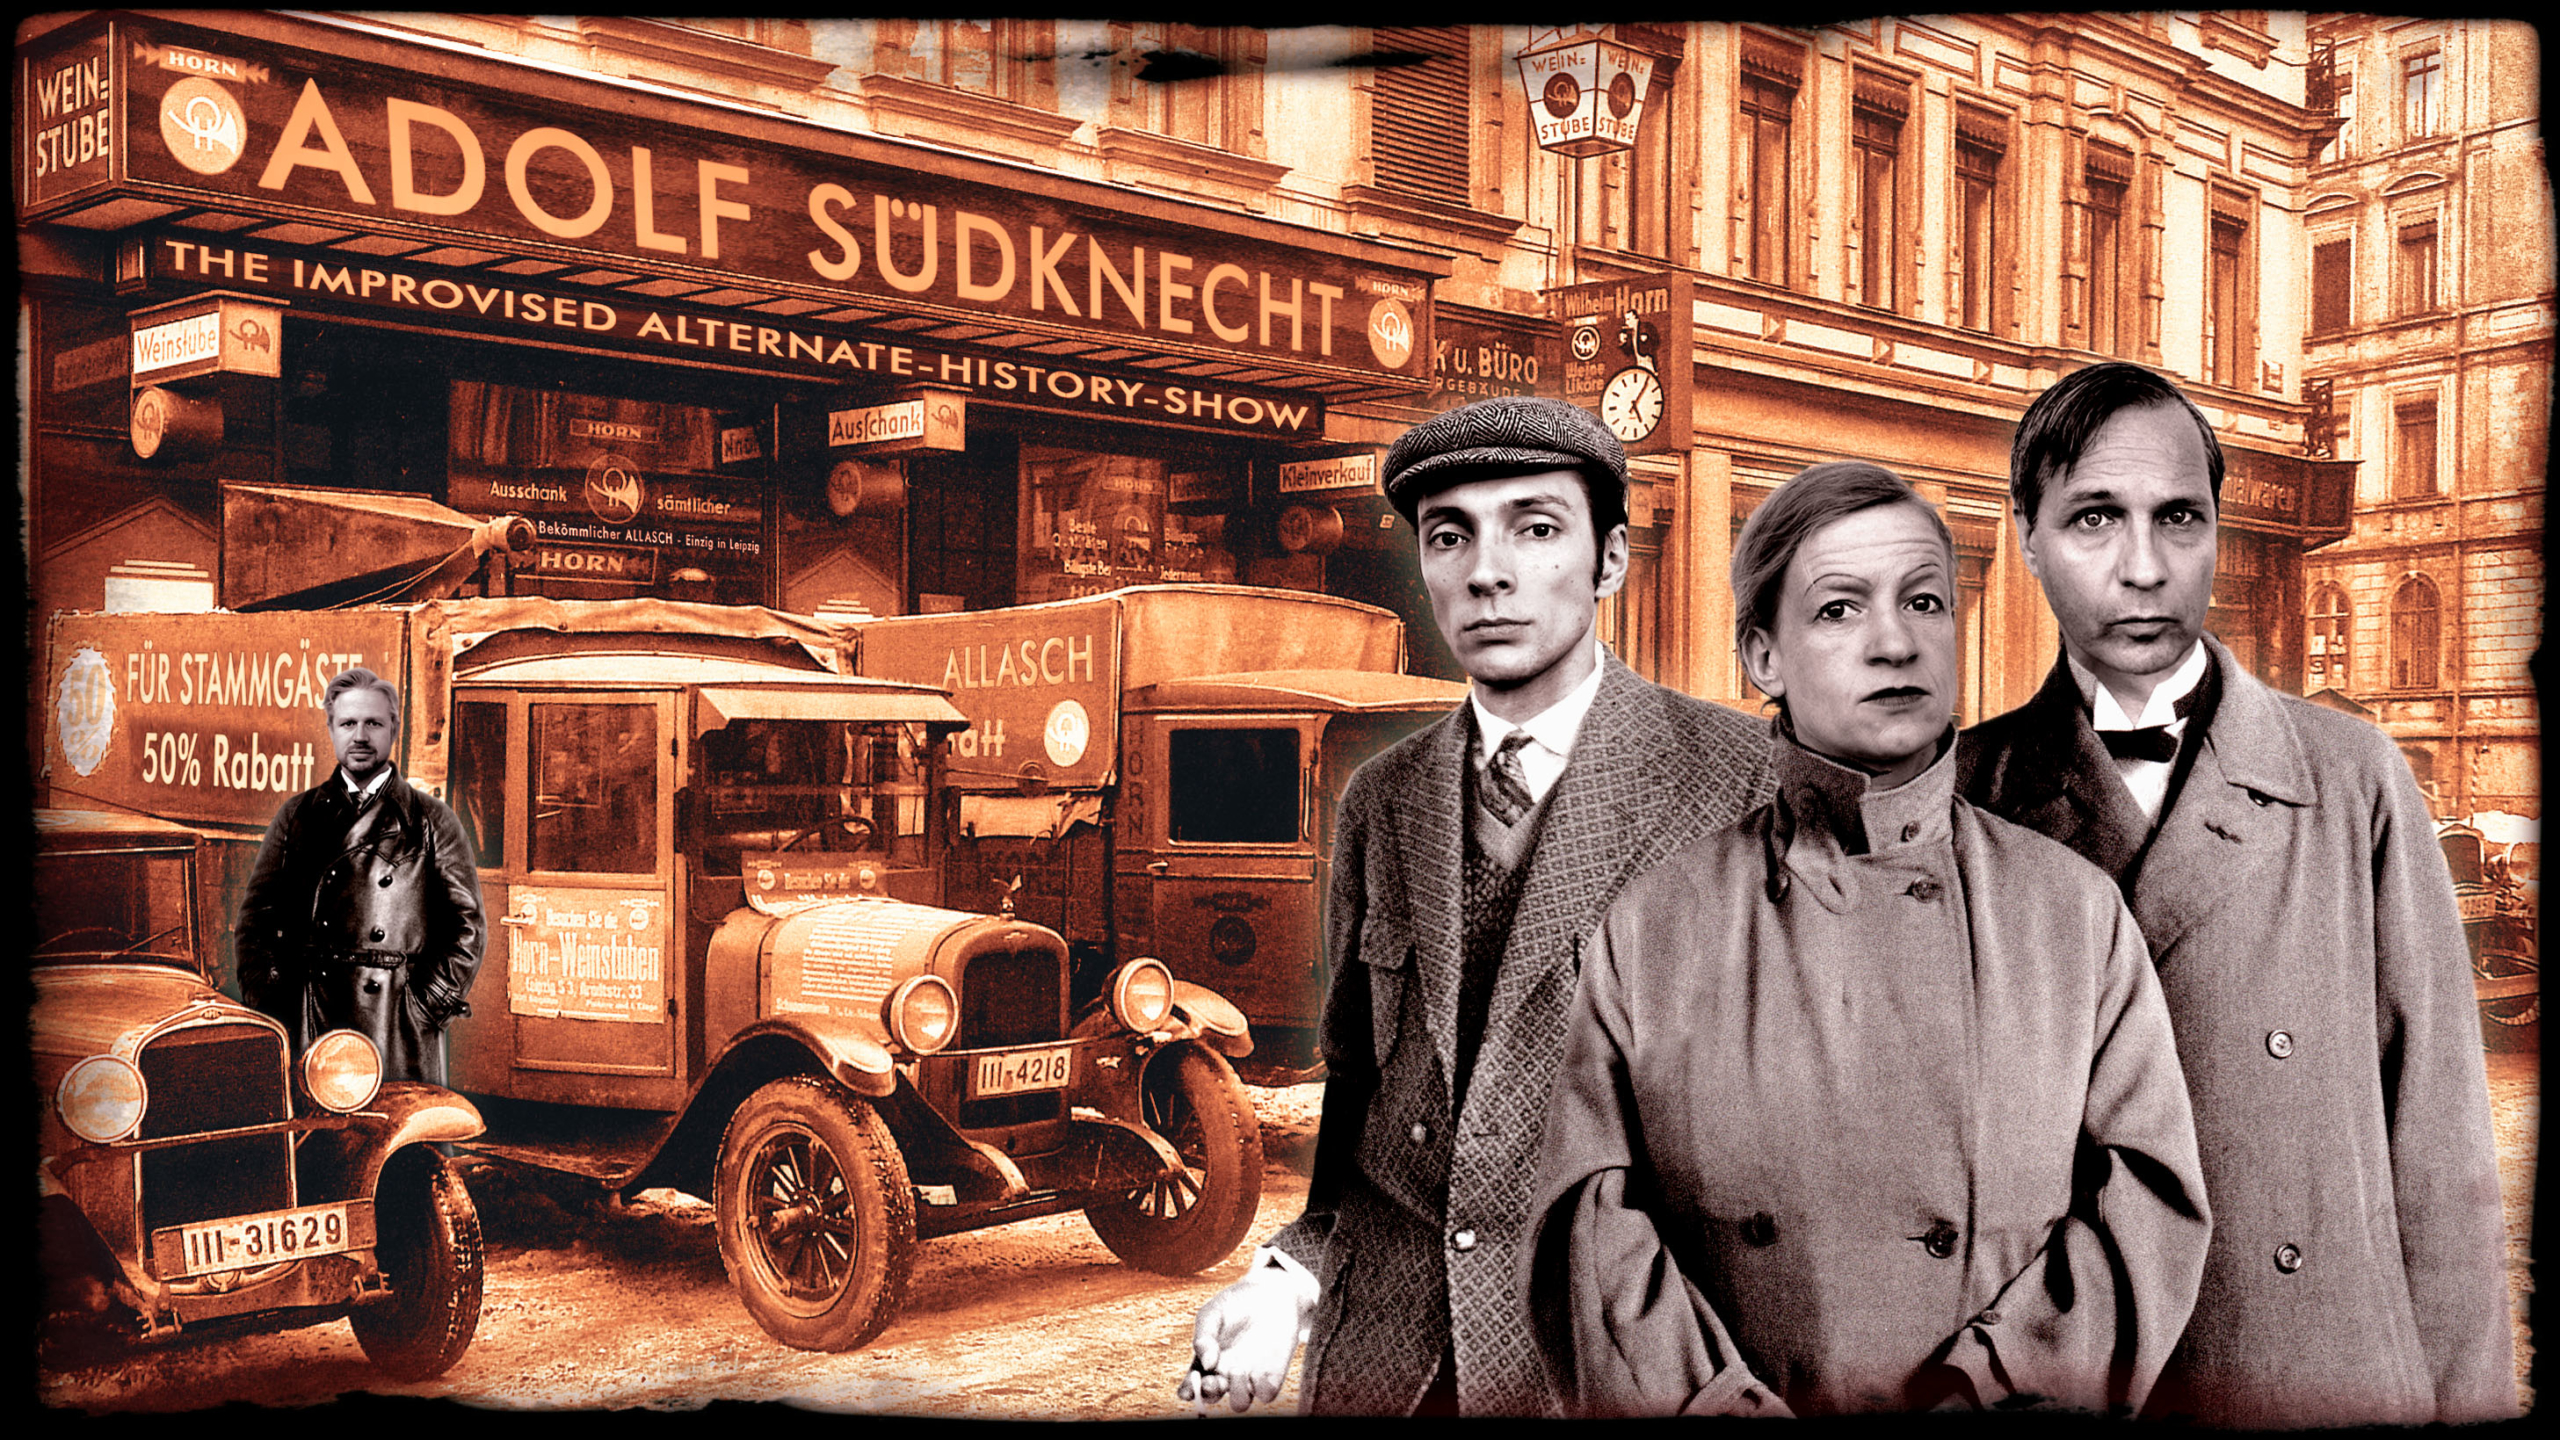 00 AdolfSüdknecht–TheImprovisedAlternate History Show Staffel2 Copyright2012 FotoArminZarbock SieheMetadaten scaled